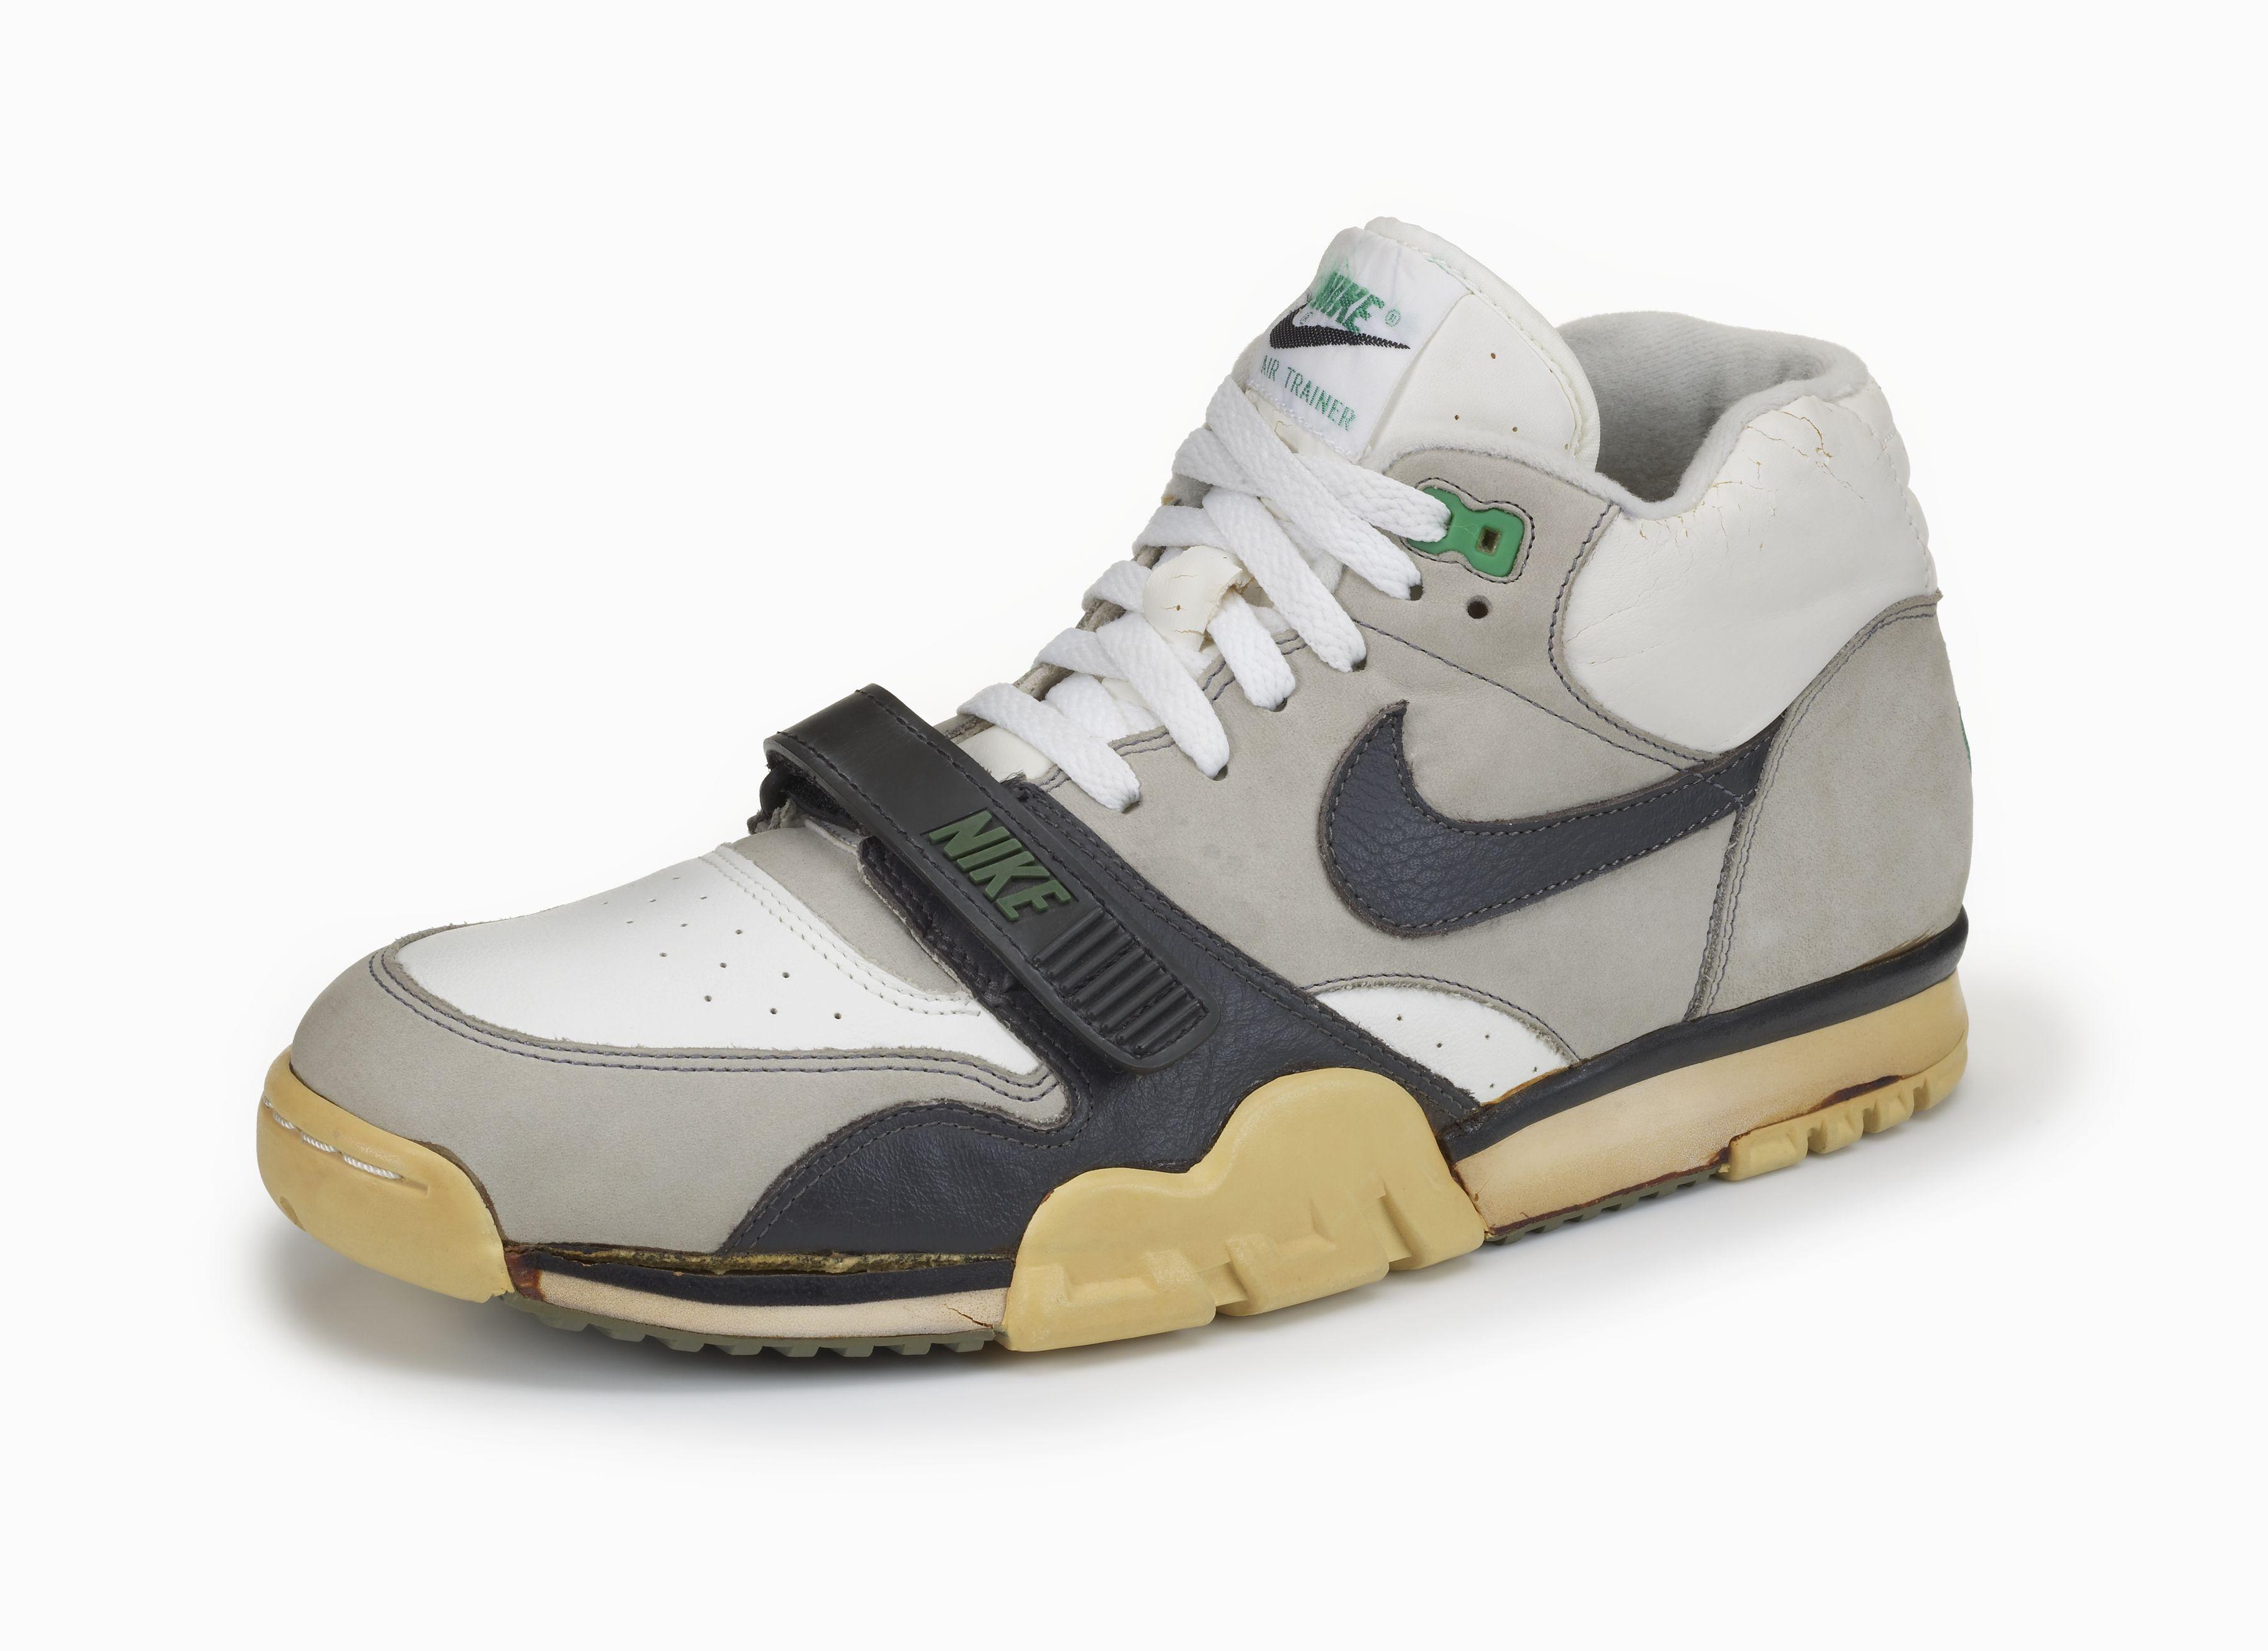 uk availability 021de 445e1 A Look at John McEnroe s Original Nike Air Trainer 1 PEs